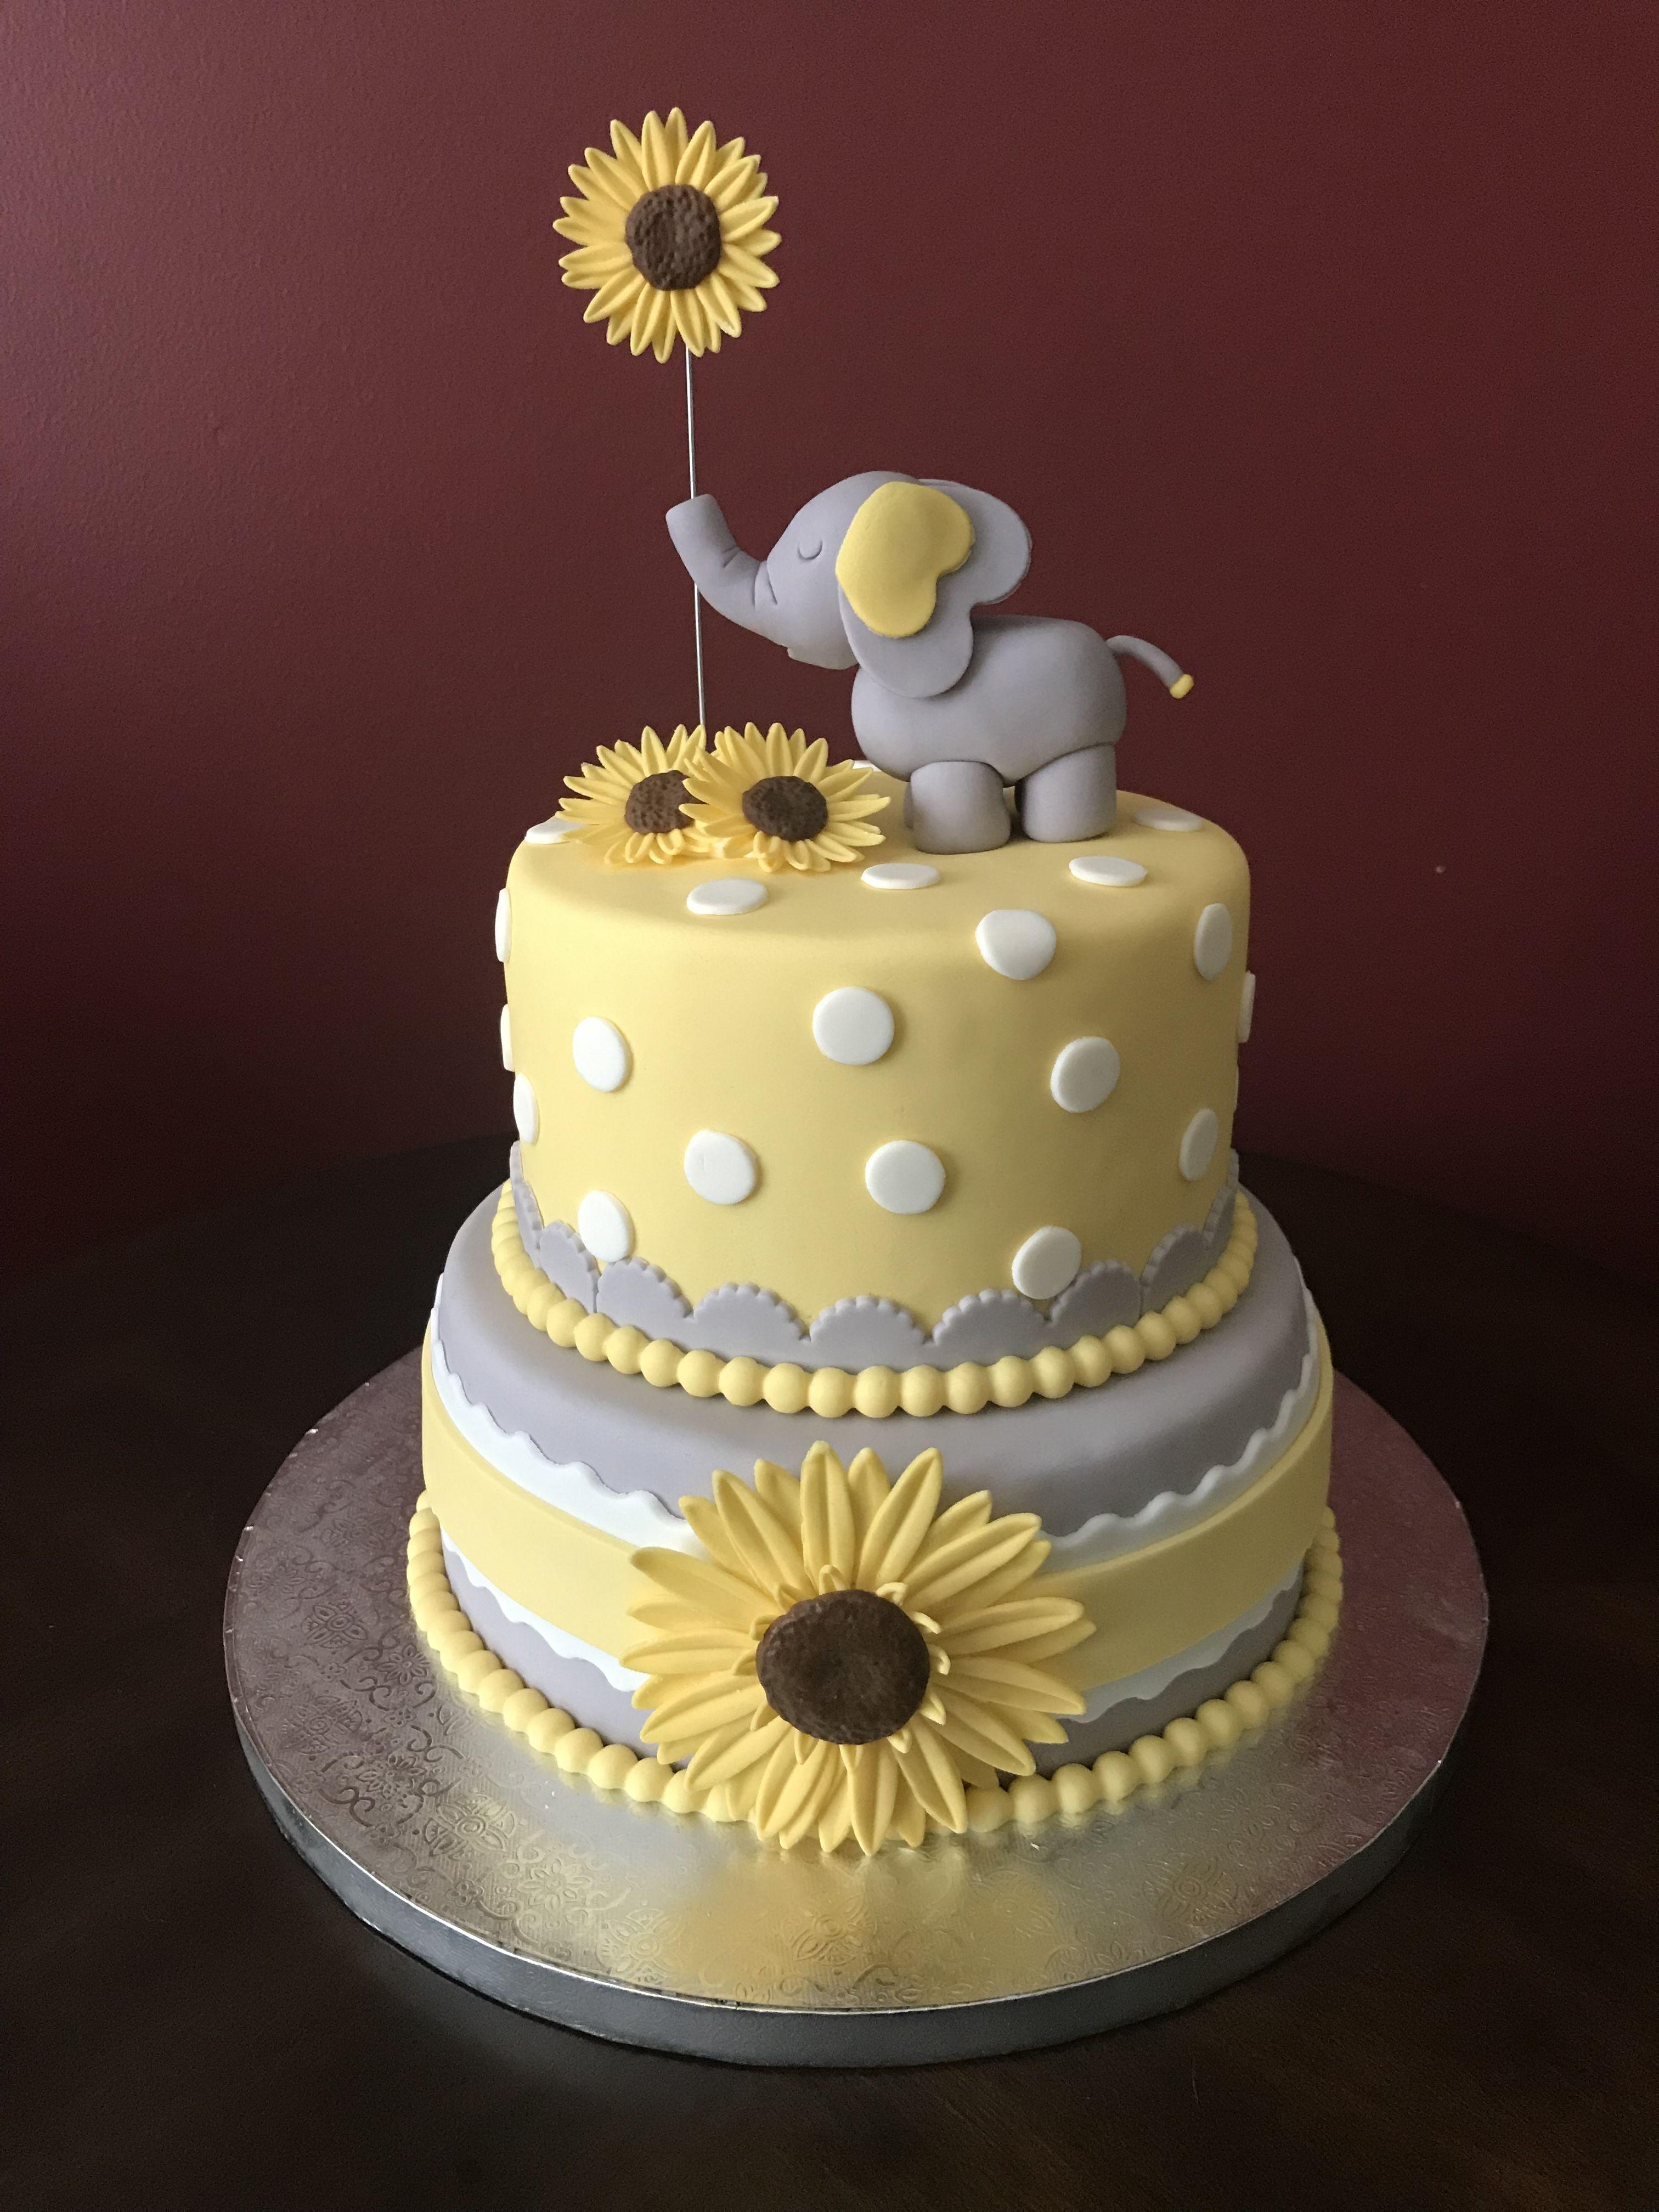 Elephant And Sunflower Baby Shower Cake